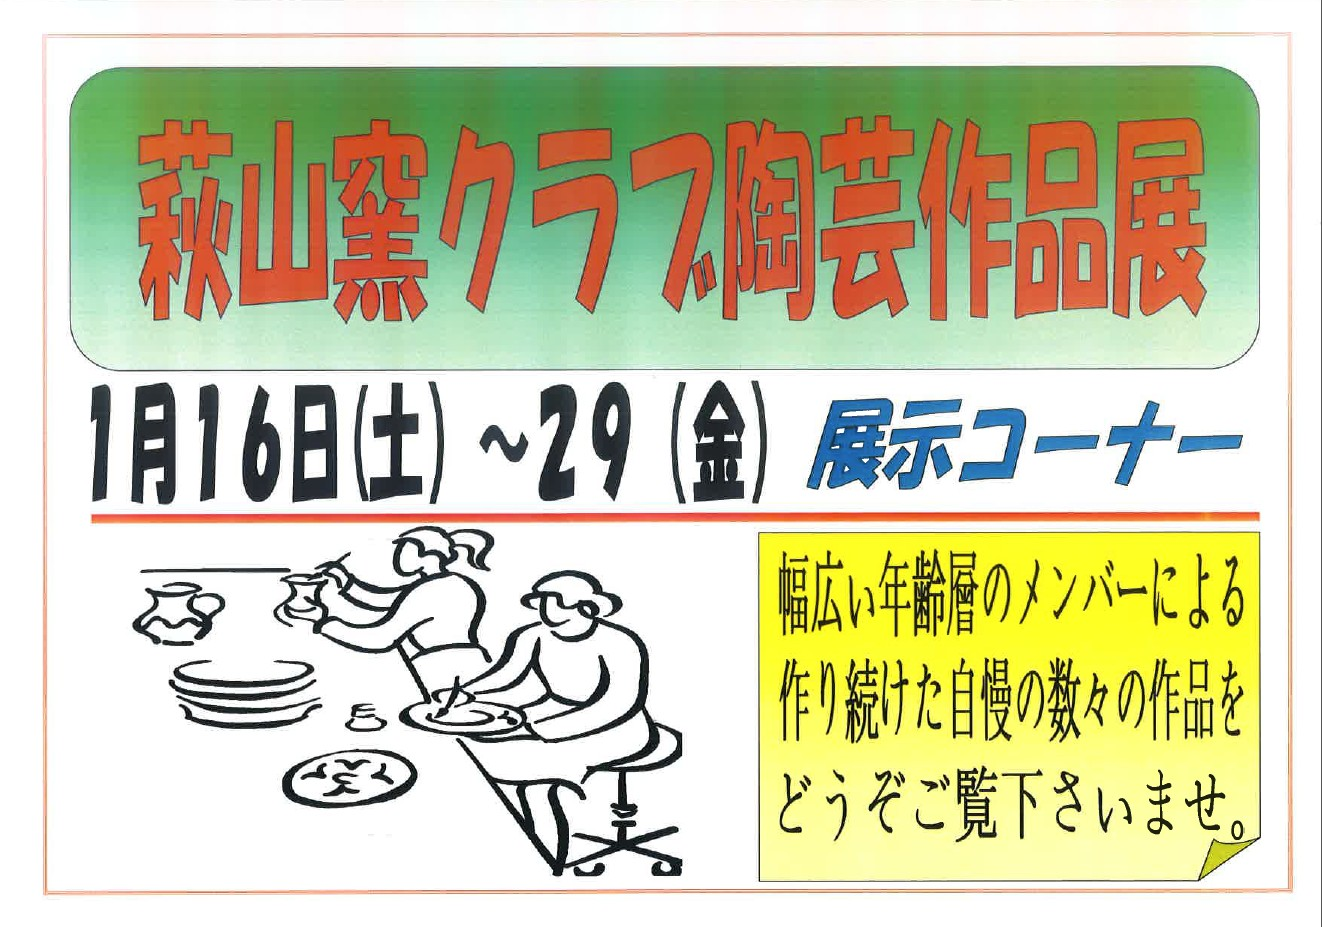 http://www.ajisainosato.com/info/images/2016y01m06d_195001882.jpg